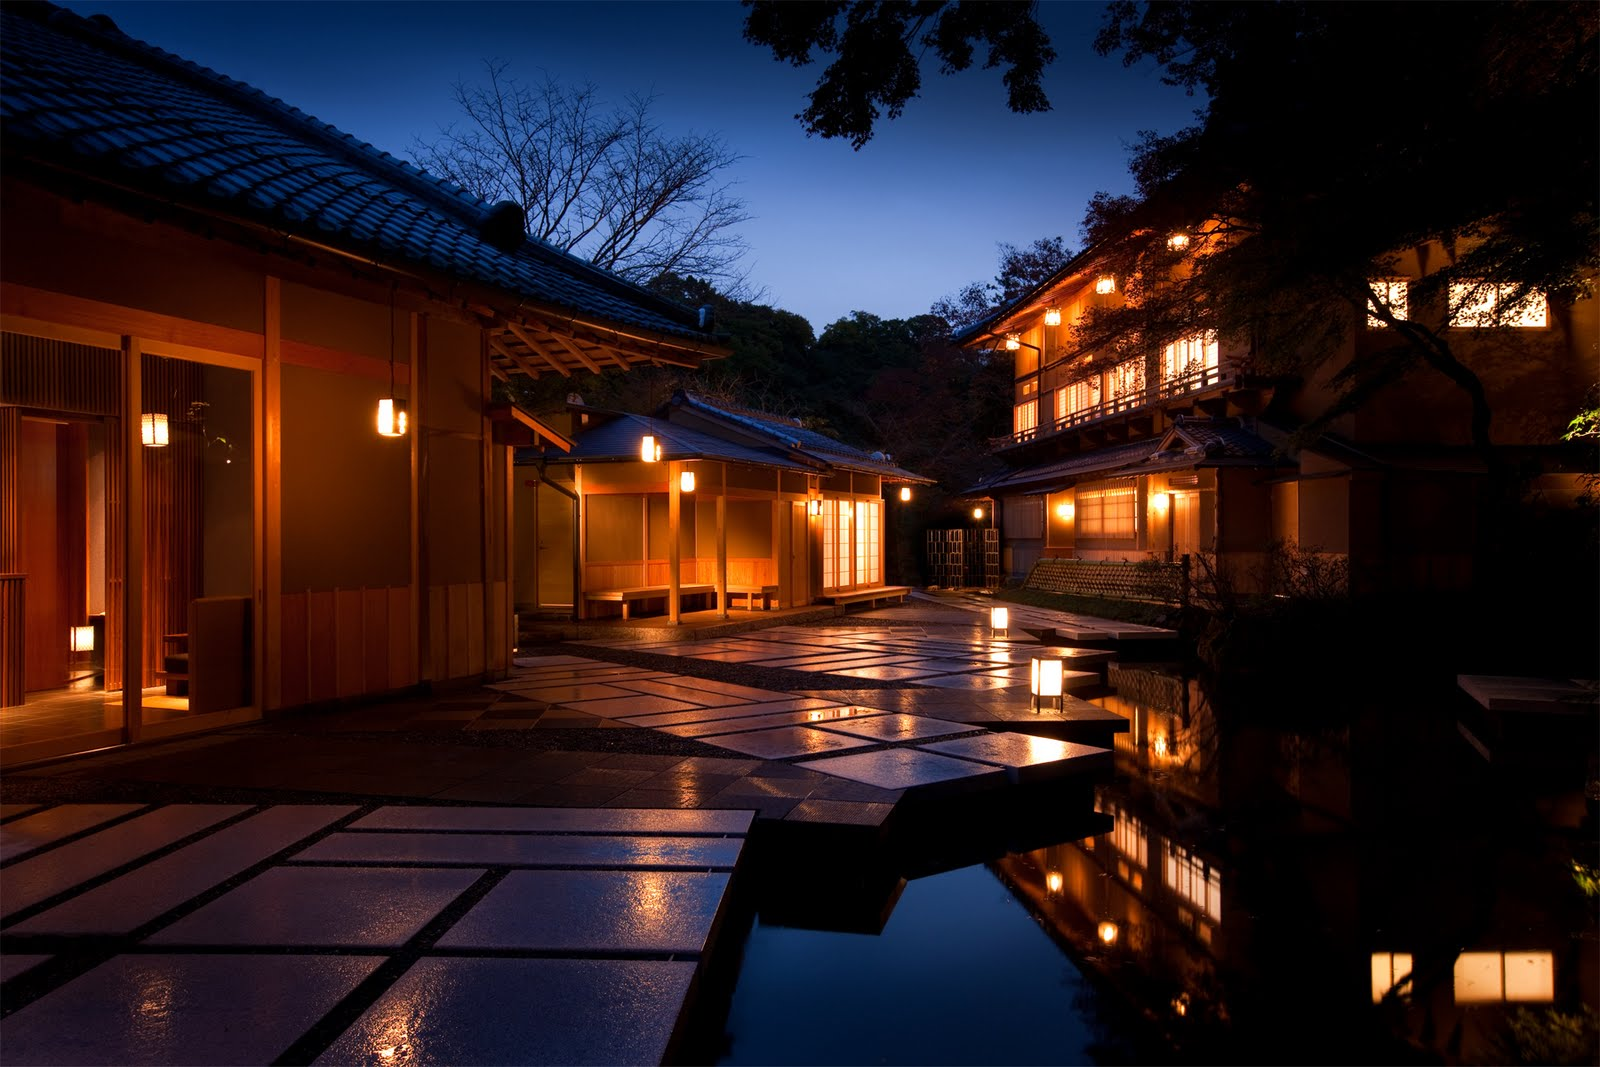 japanese inn hoshinoya kyoto wallpaper bonsai wallpaper kyoto by 1600x1067